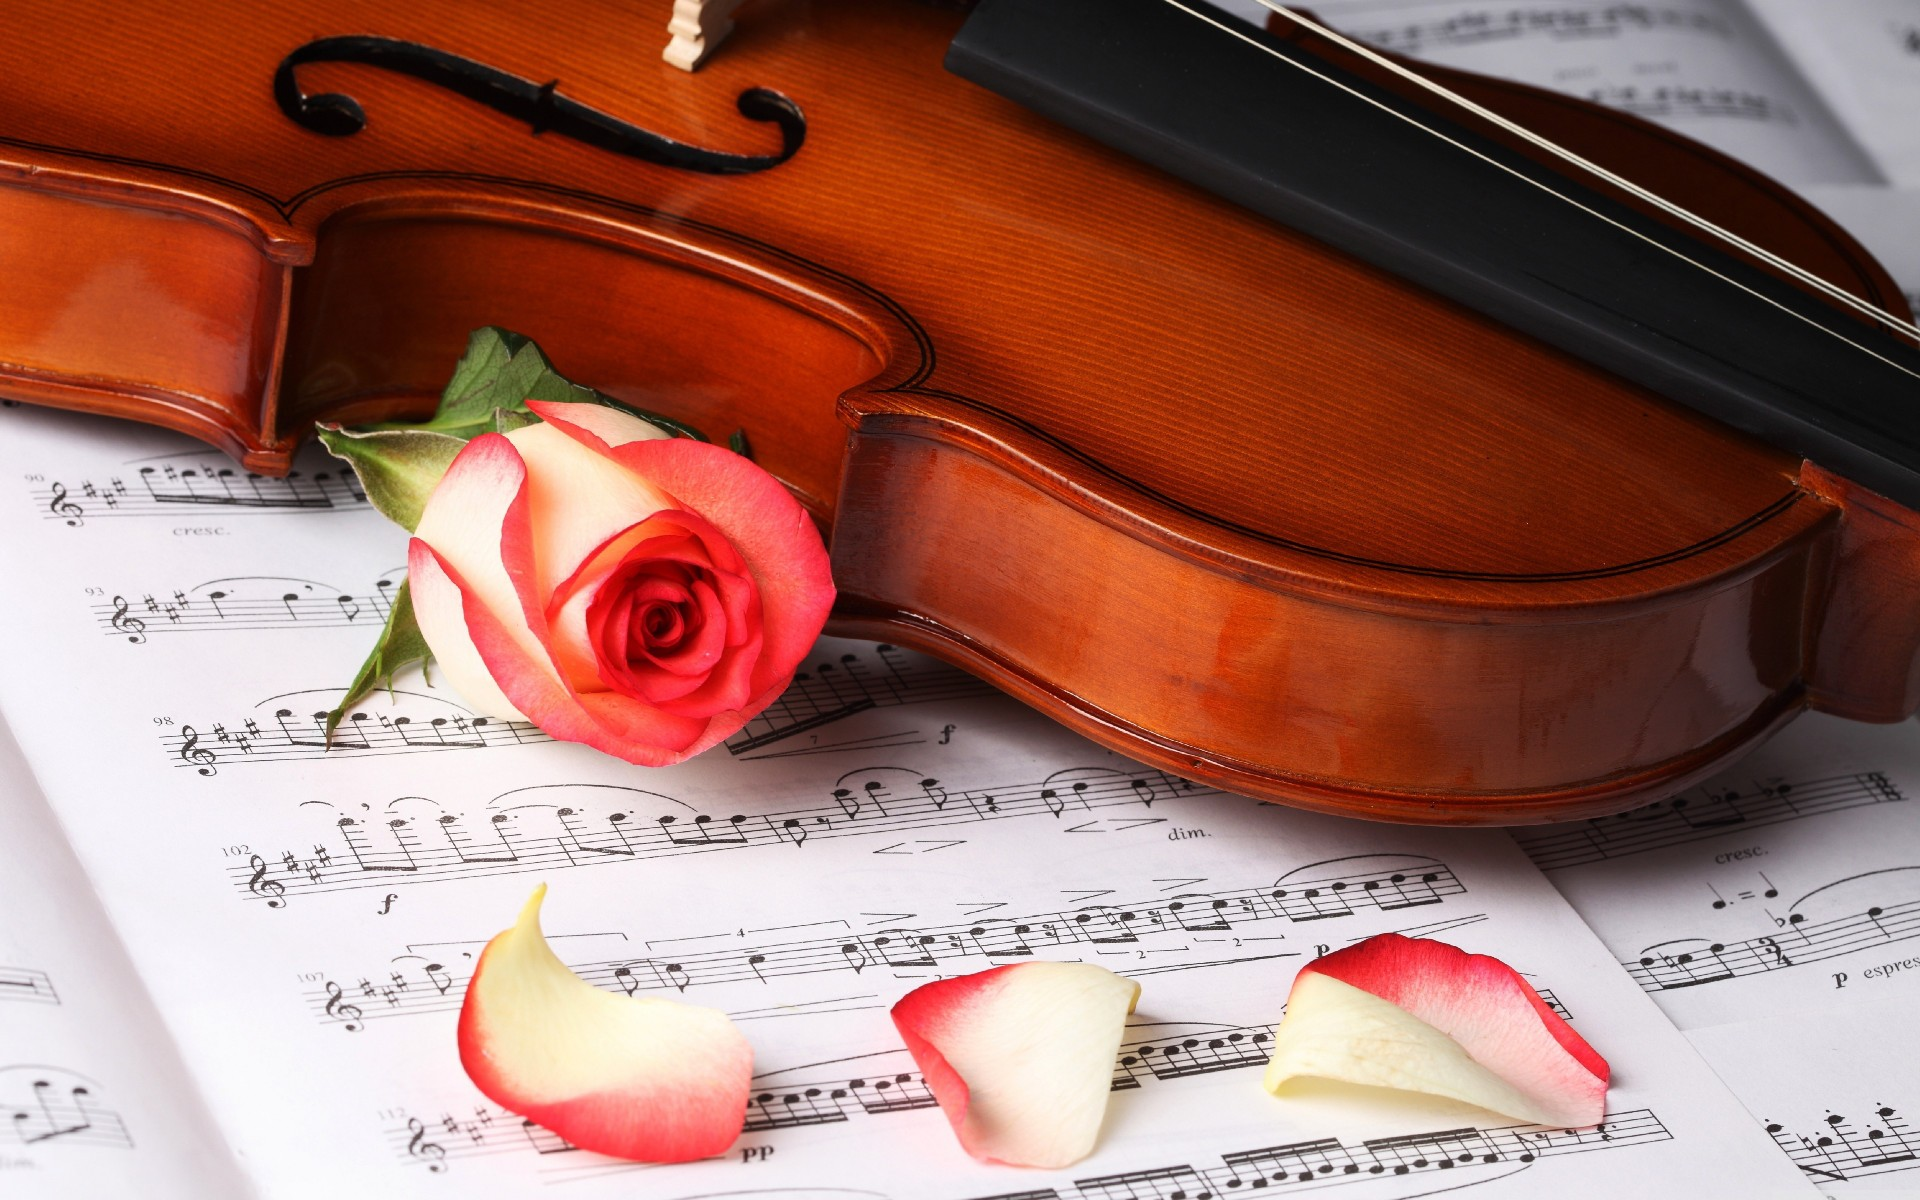 скрипка, ноты, торт  № 1908221 бесплатно